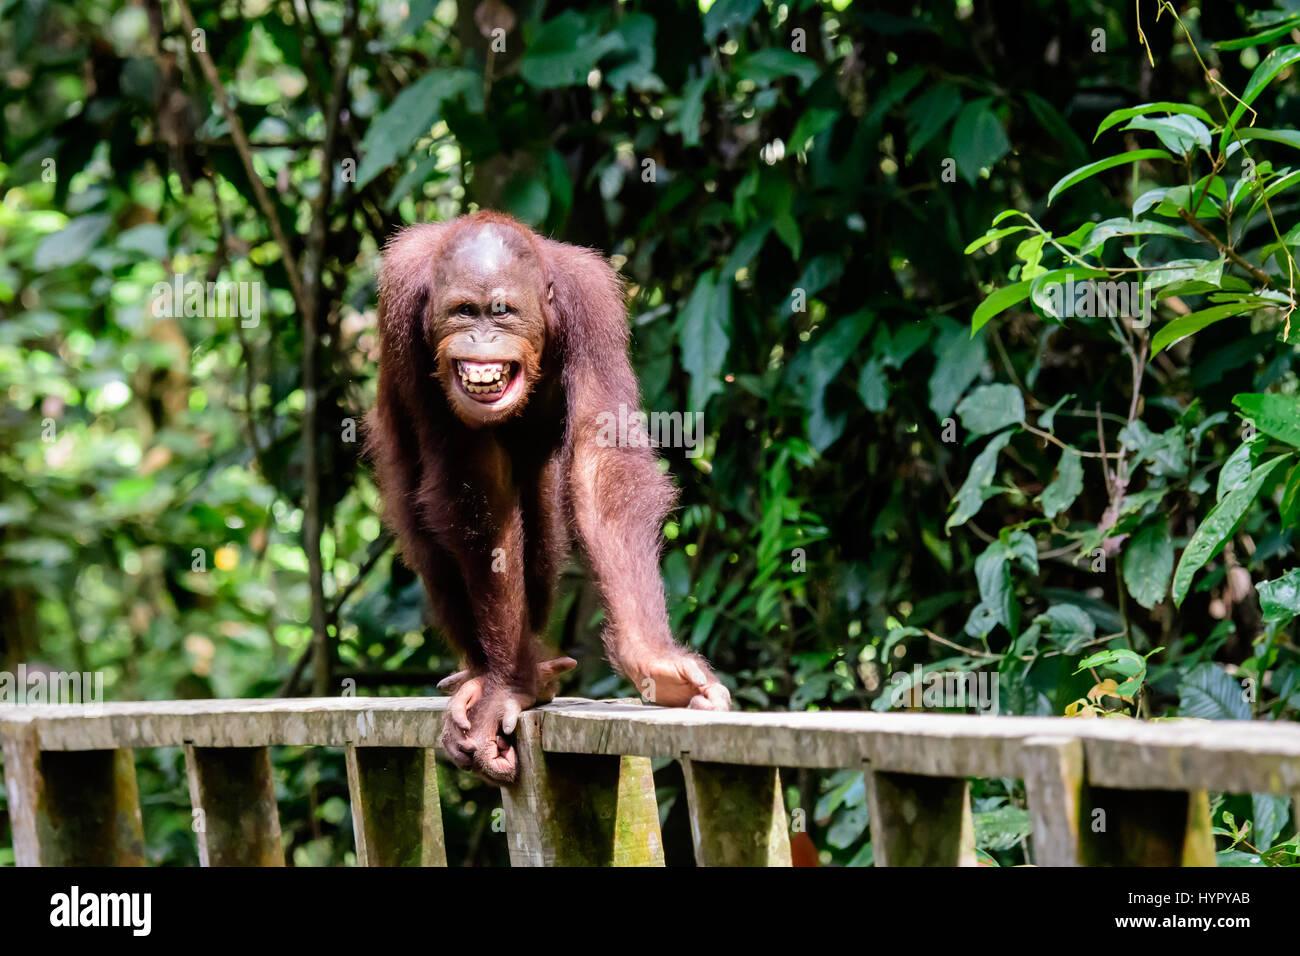 Frech grinsenden Orang-utan anfahren Stockbild